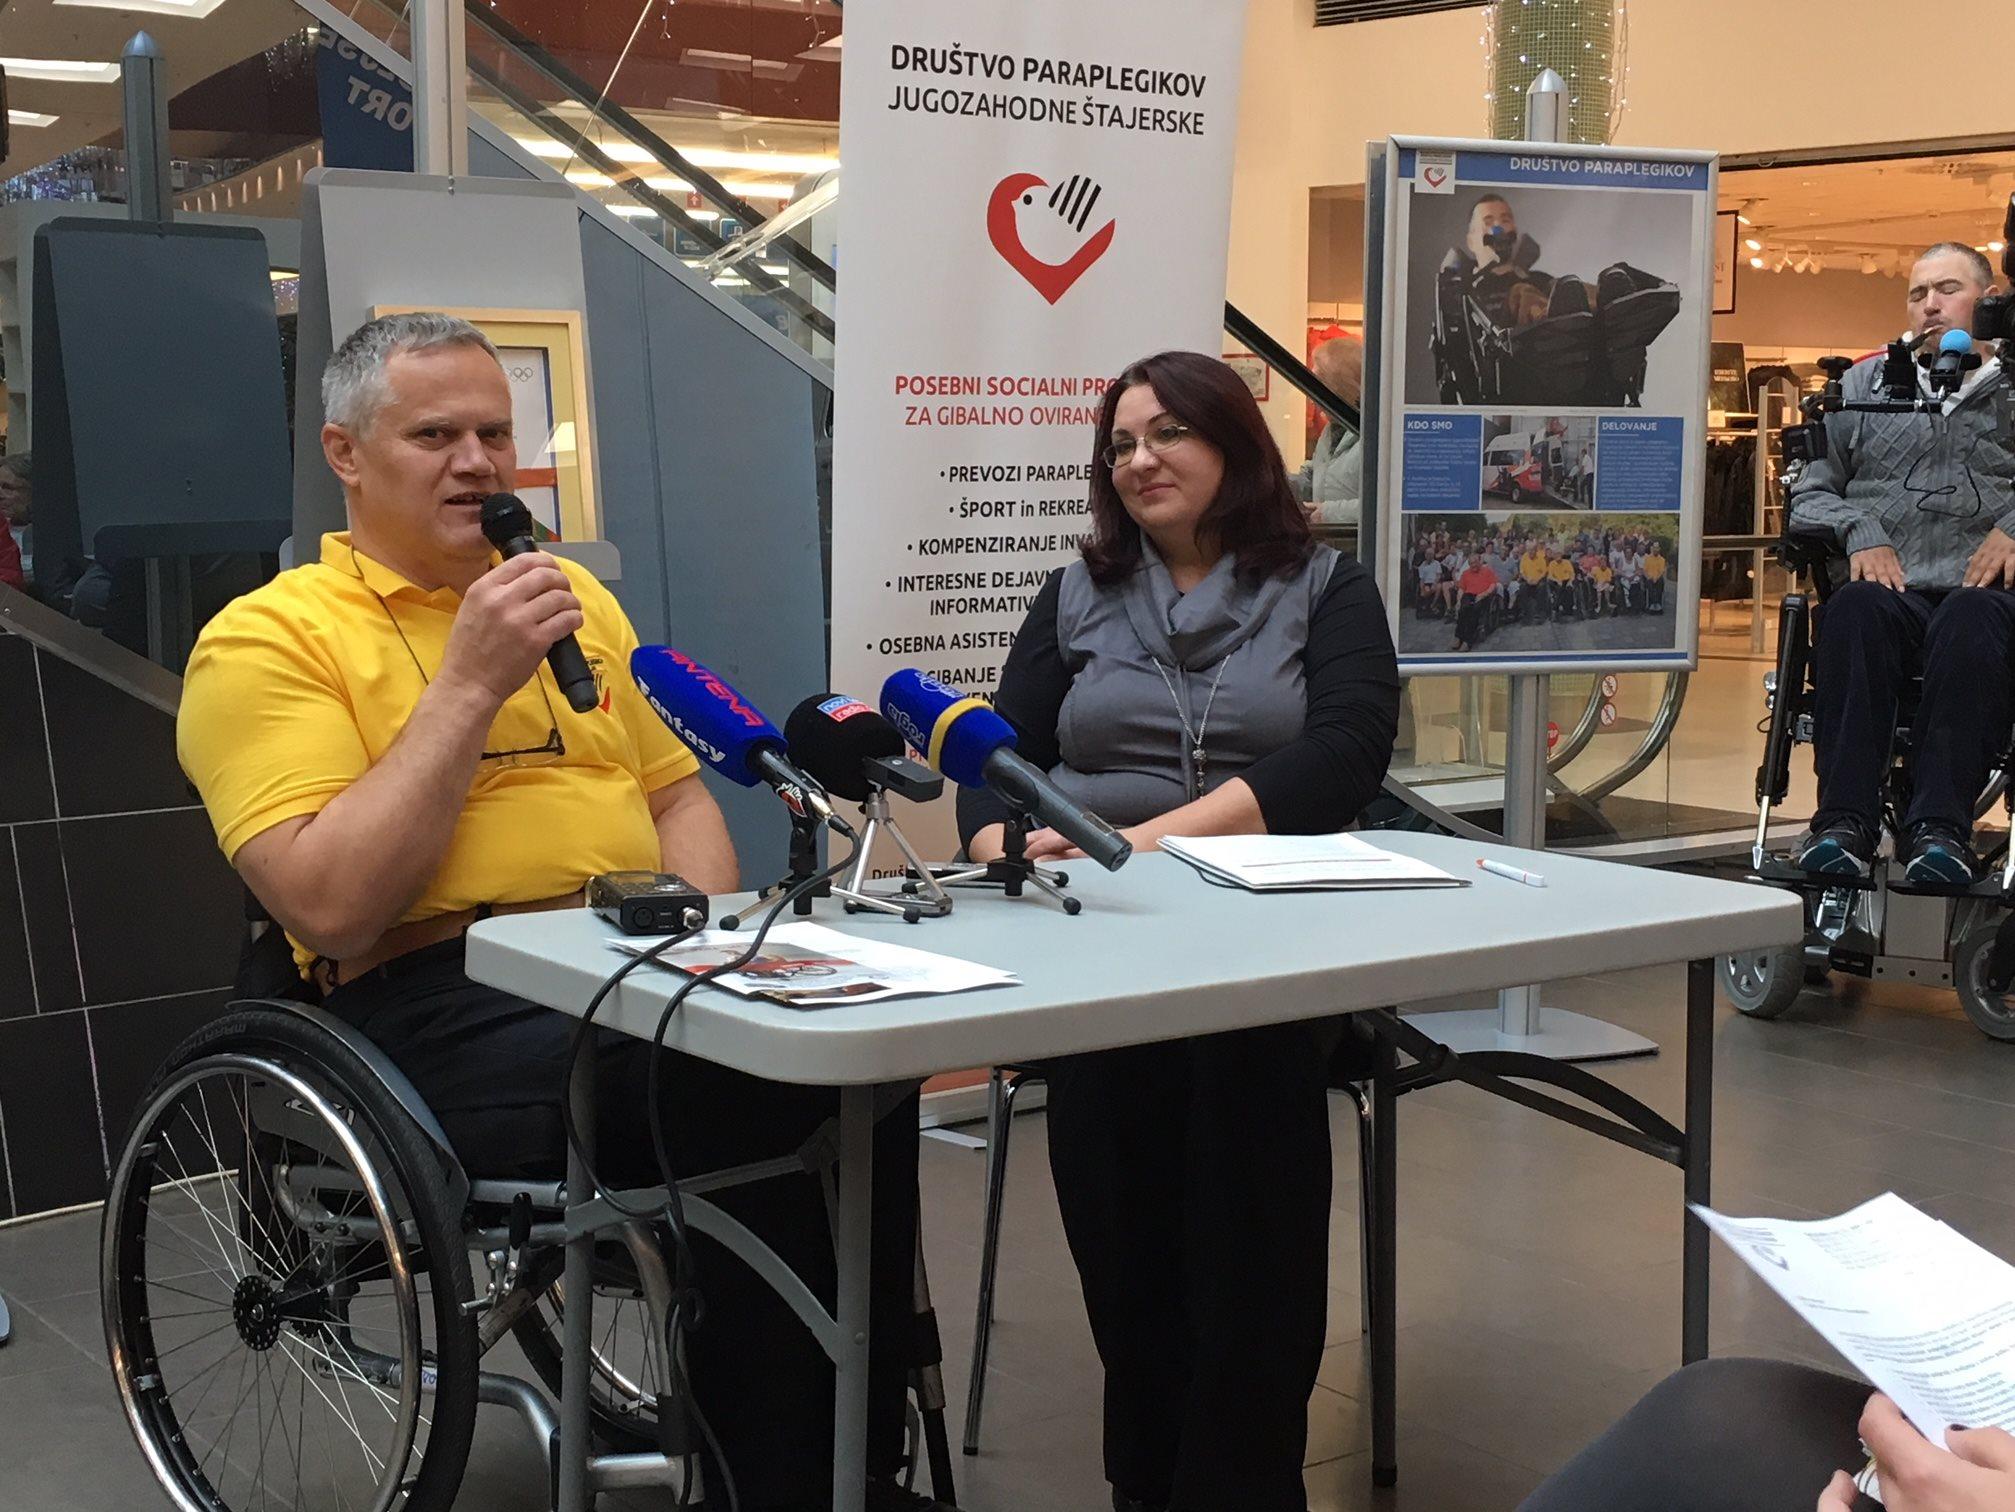 Paraplegiki